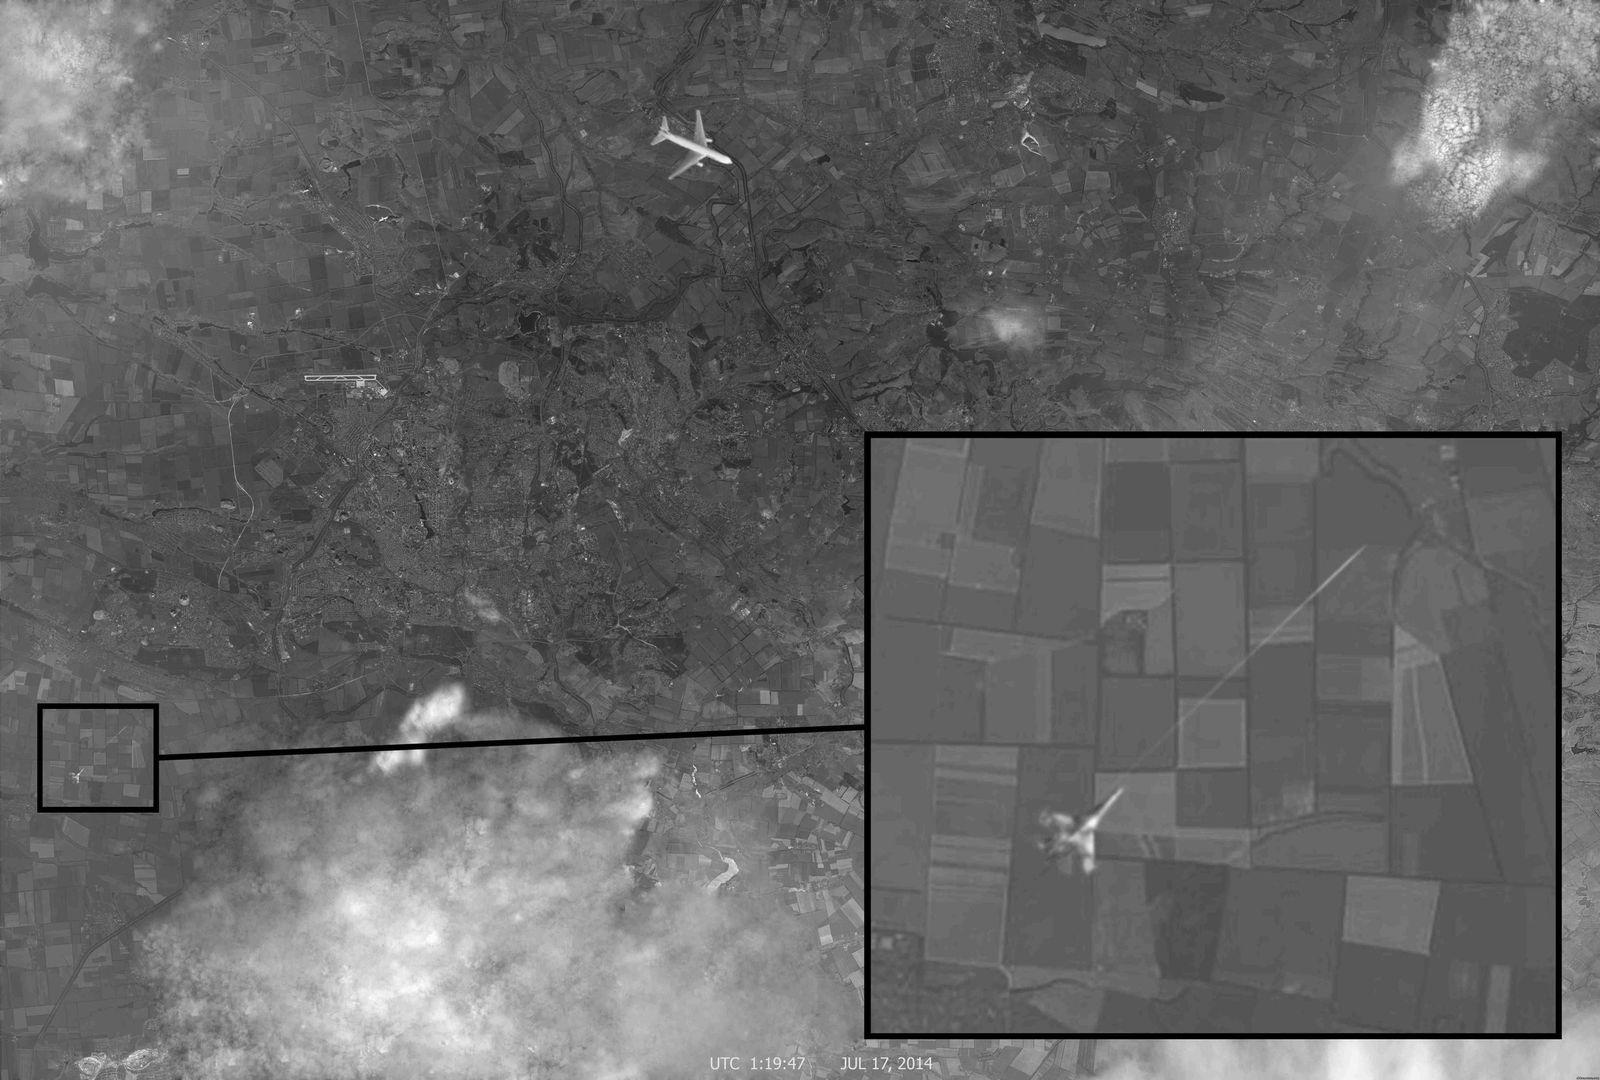 Mh17/ Kampflugzeug/ Satellitenbild